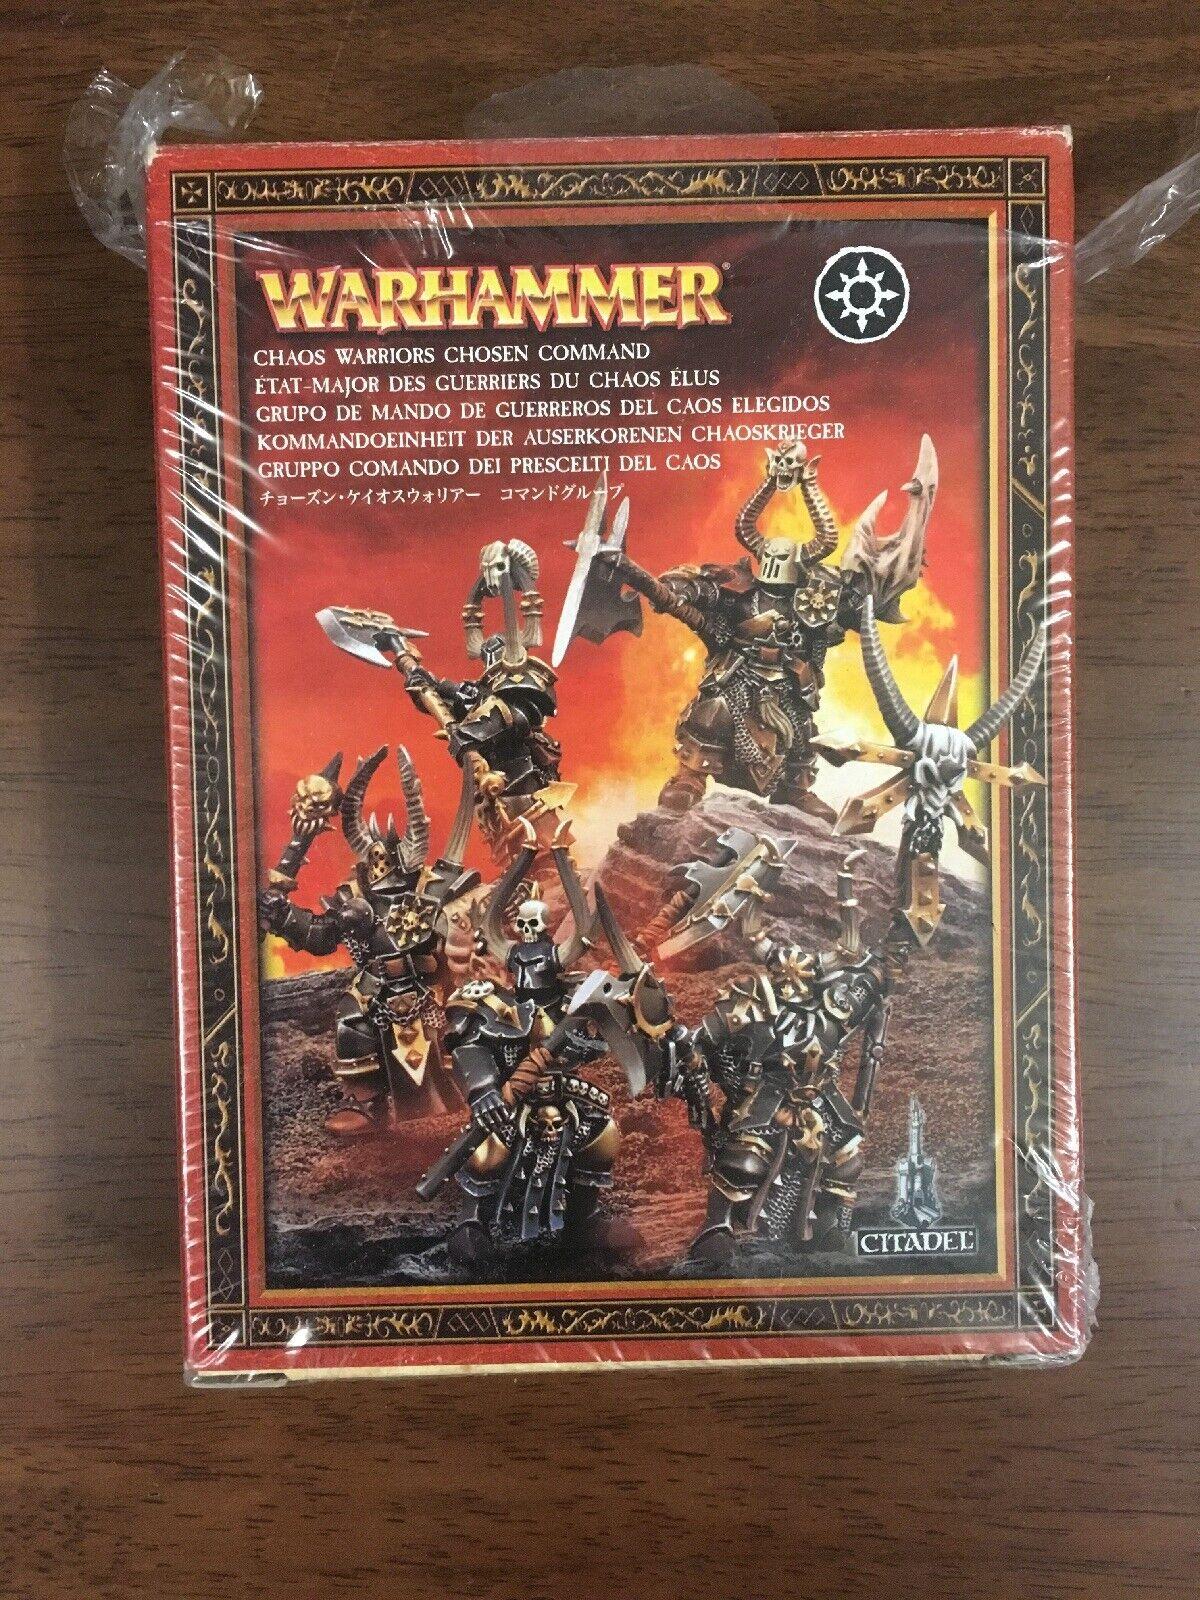 migliore marca Chaos Warrior Chosen Comuomod Set Set Set Age Of Sigmar NIB OOP AoS Warhammer fantasyc  comprare a buon mercato